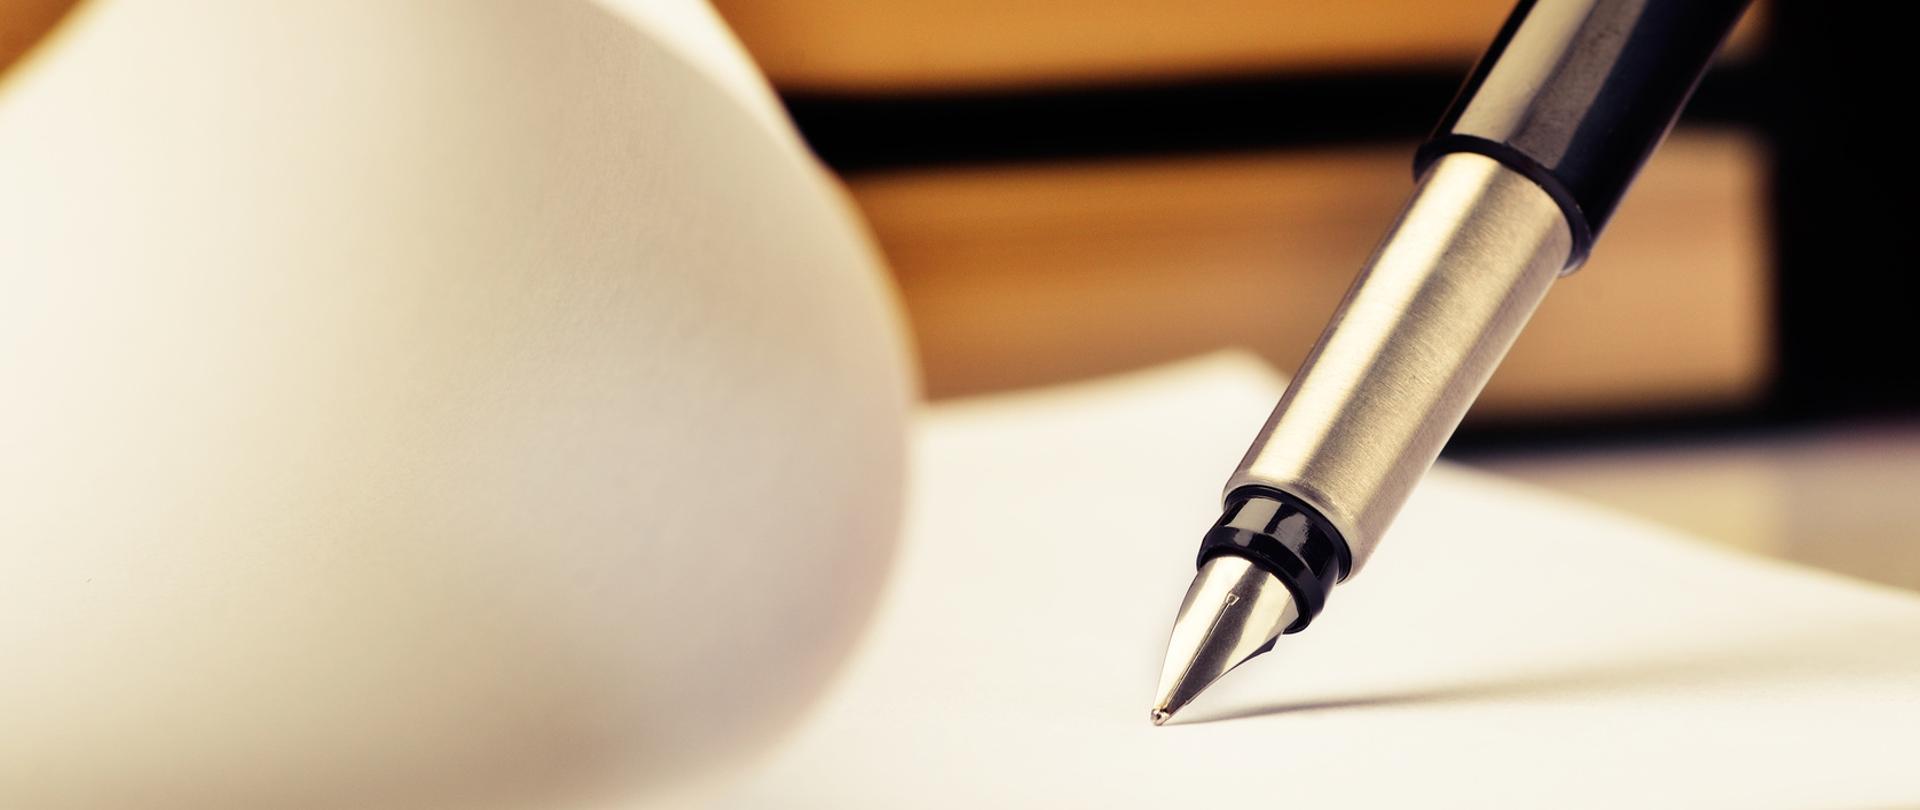 Pióro dotyka kartki papieru.